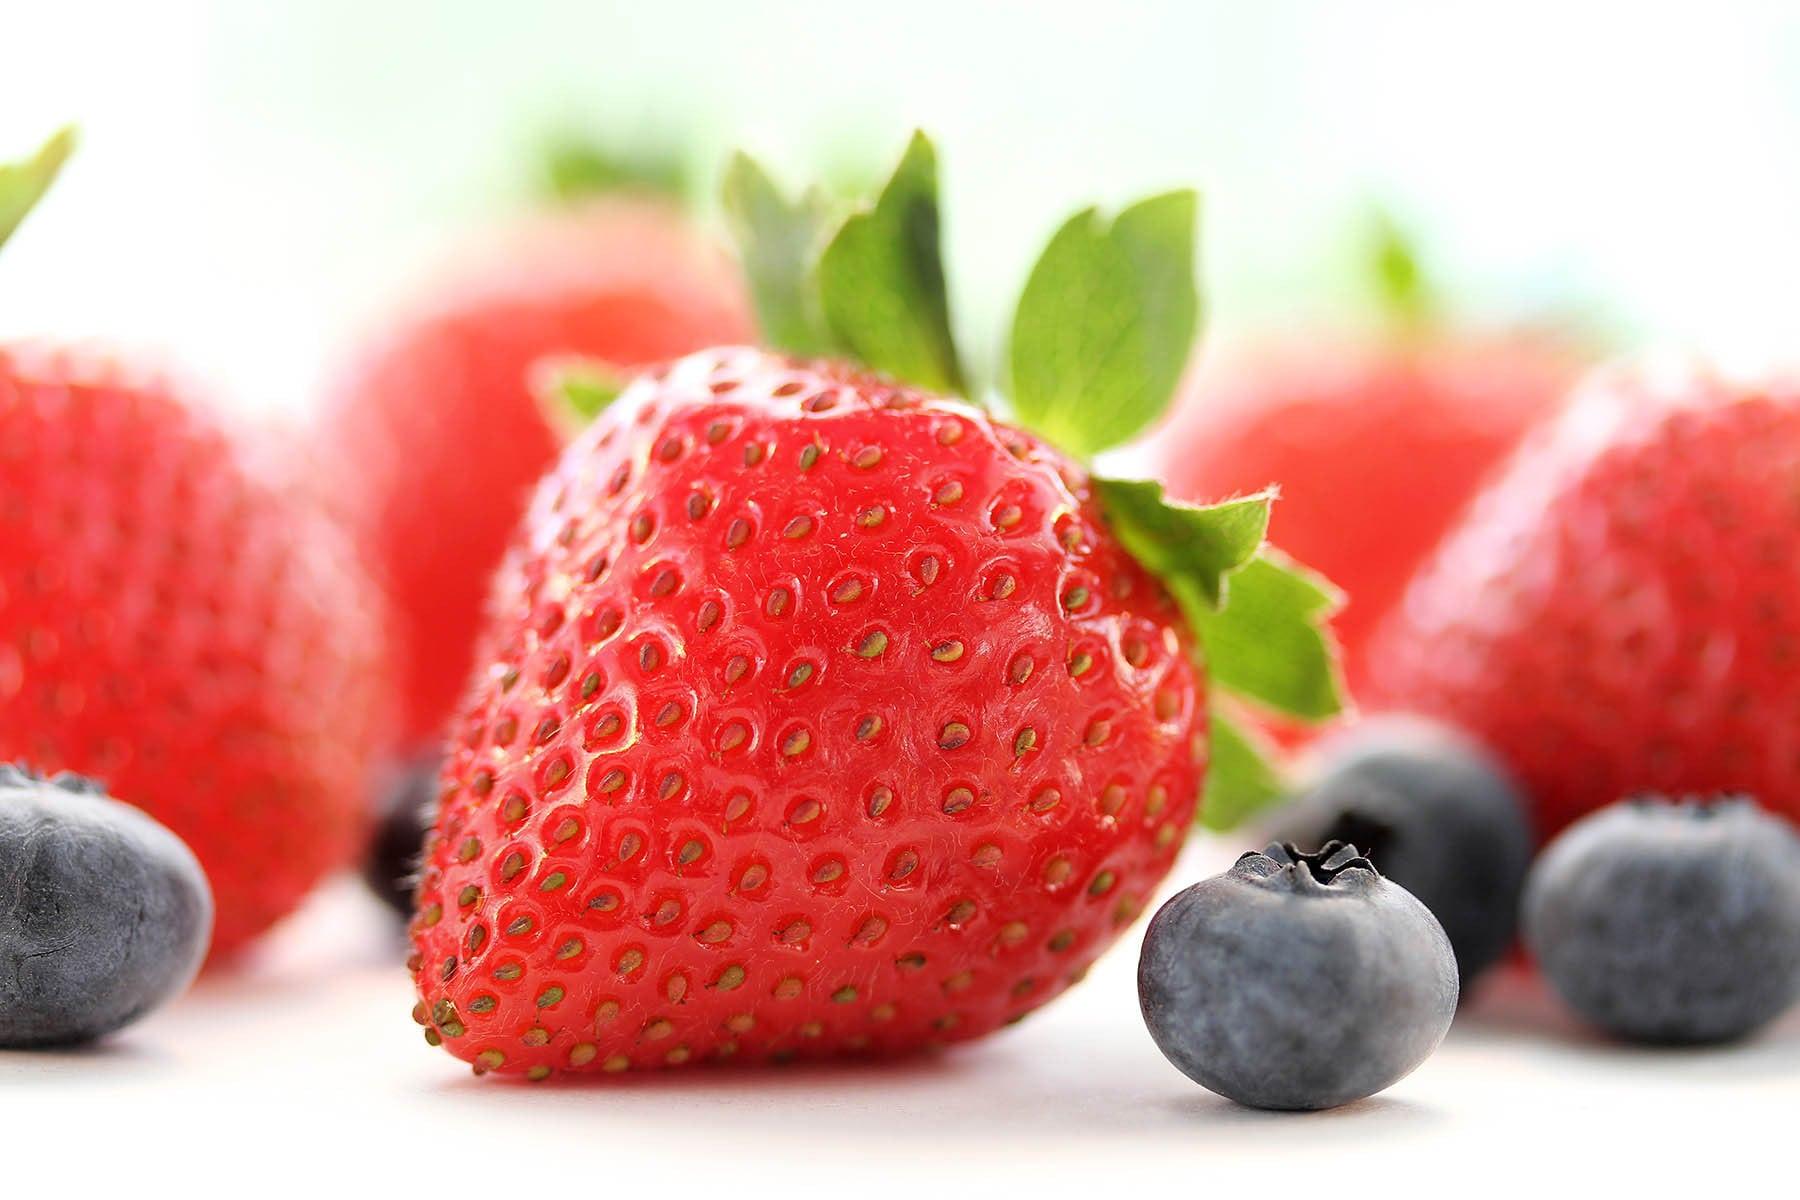 Lou-Manna-Strawberries-Blueberries